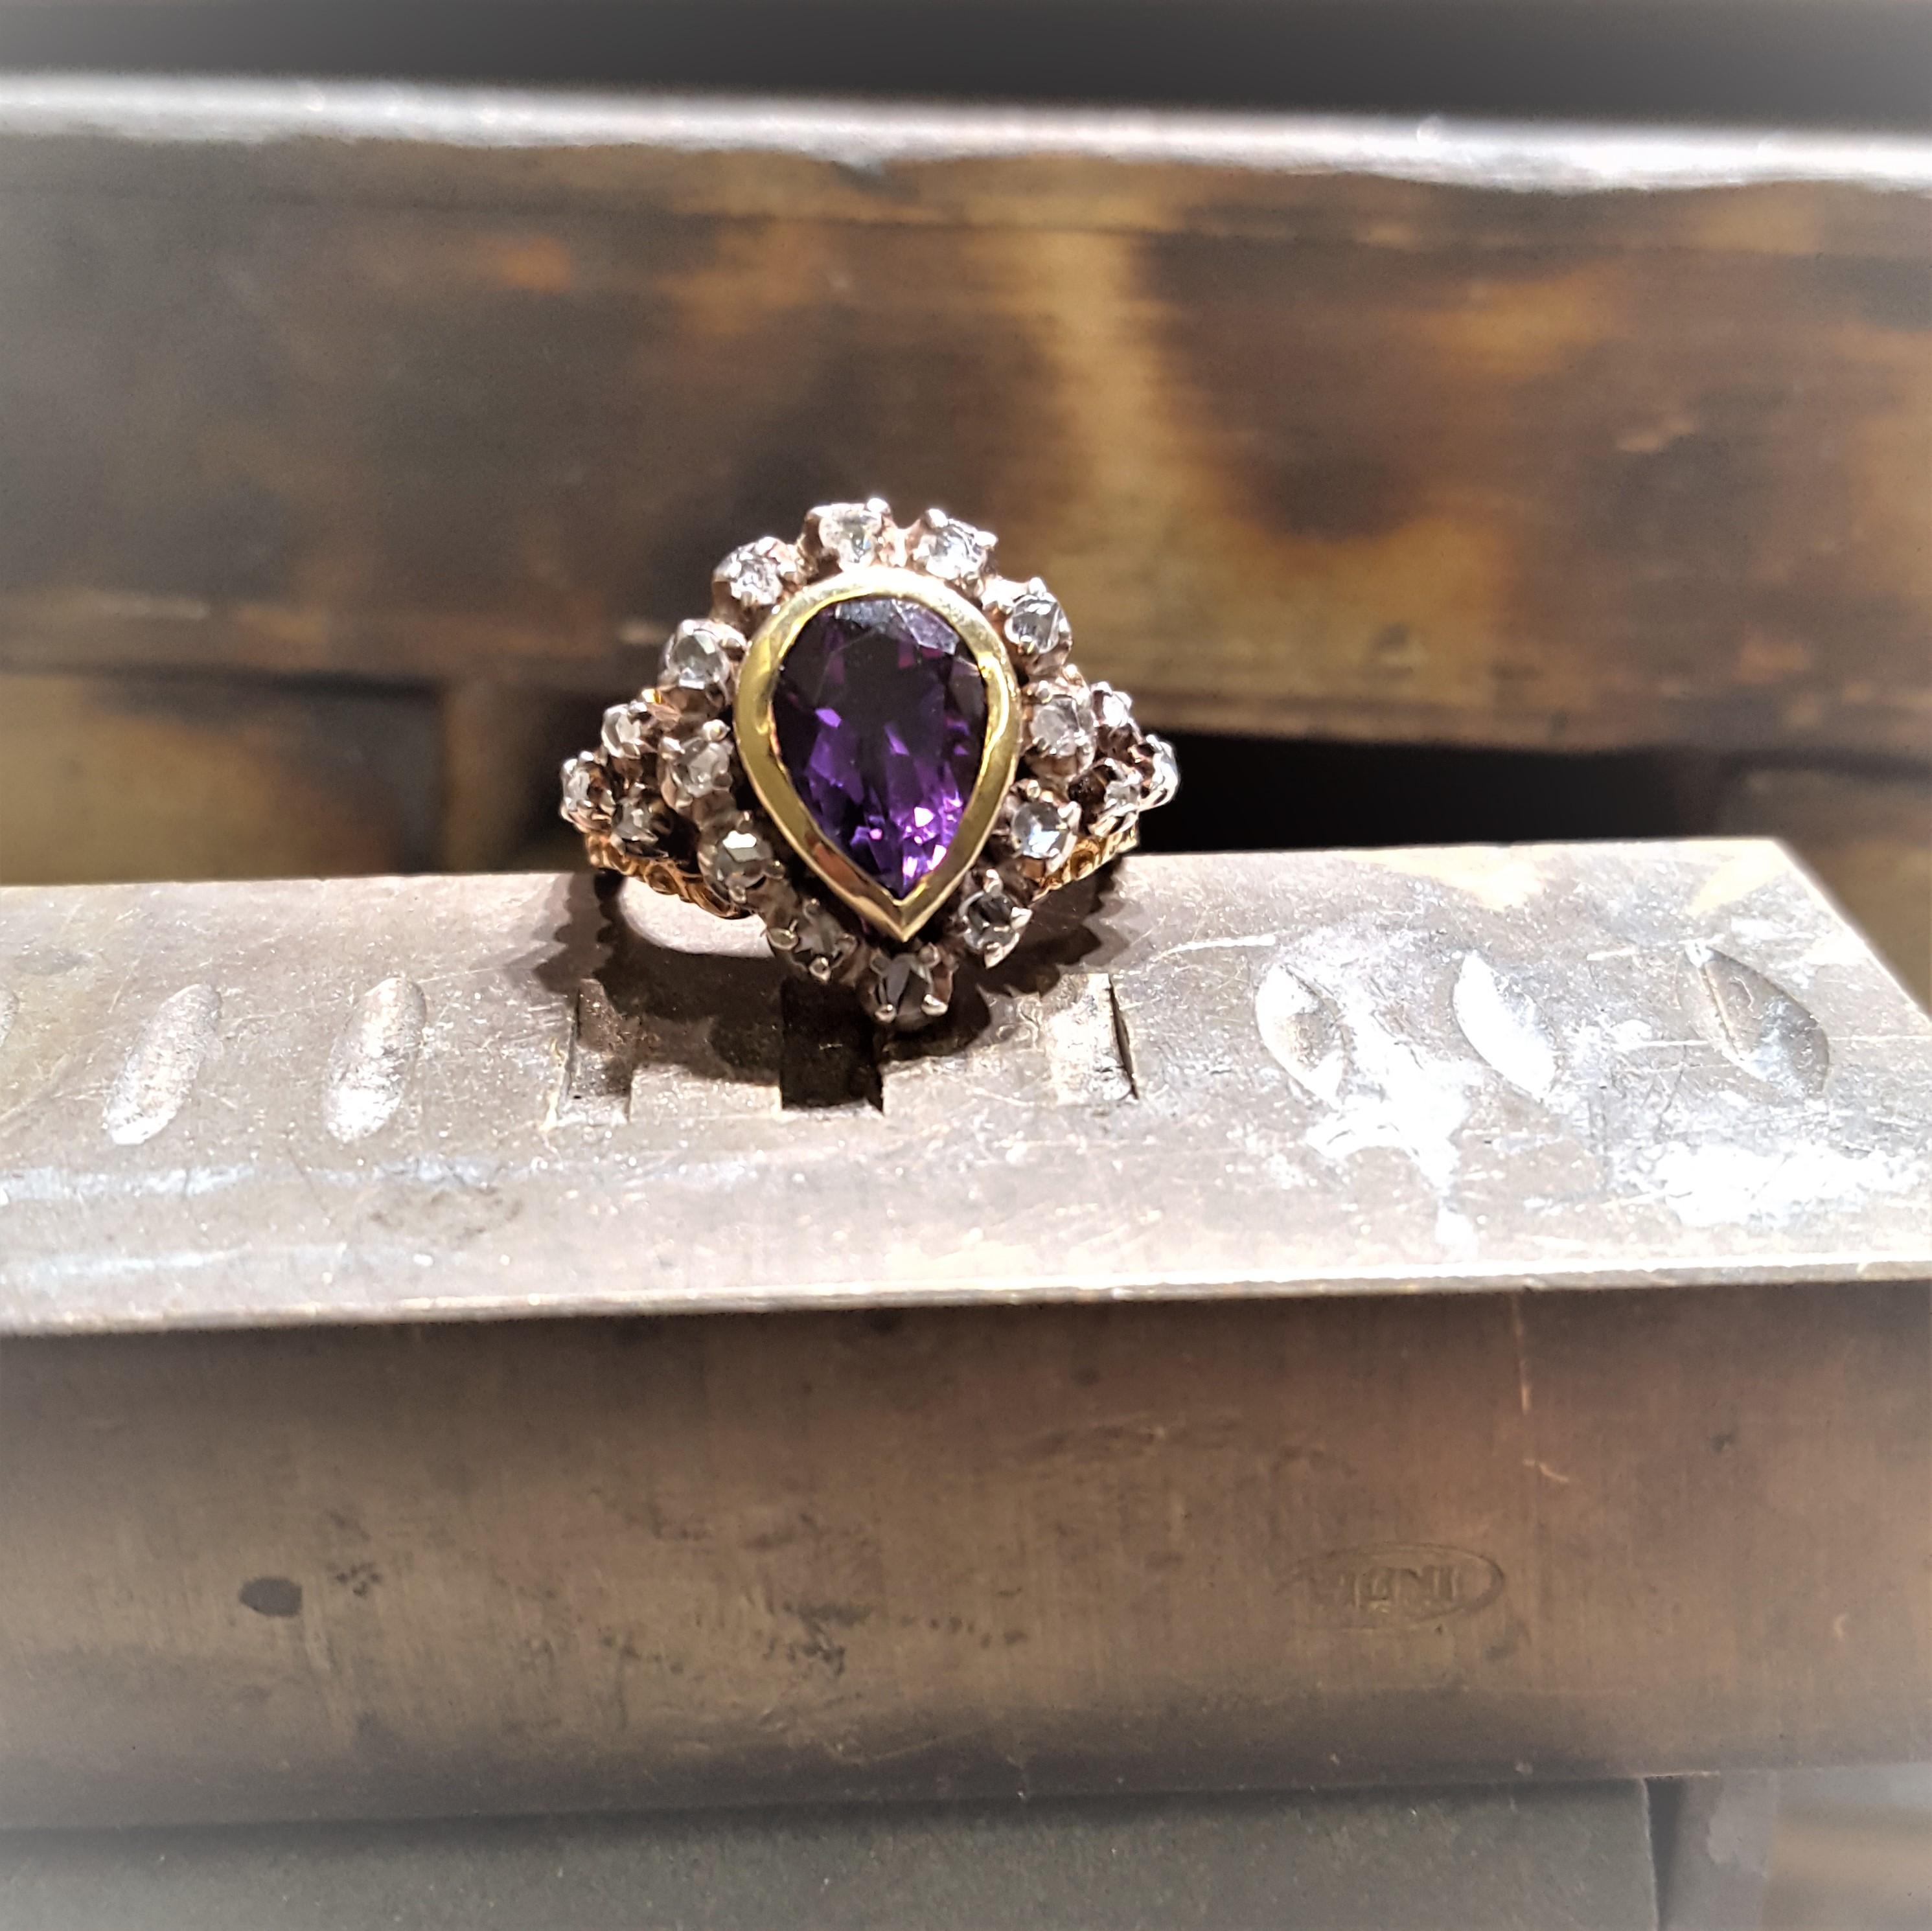 1880s Pear Amethyst & Diamonds